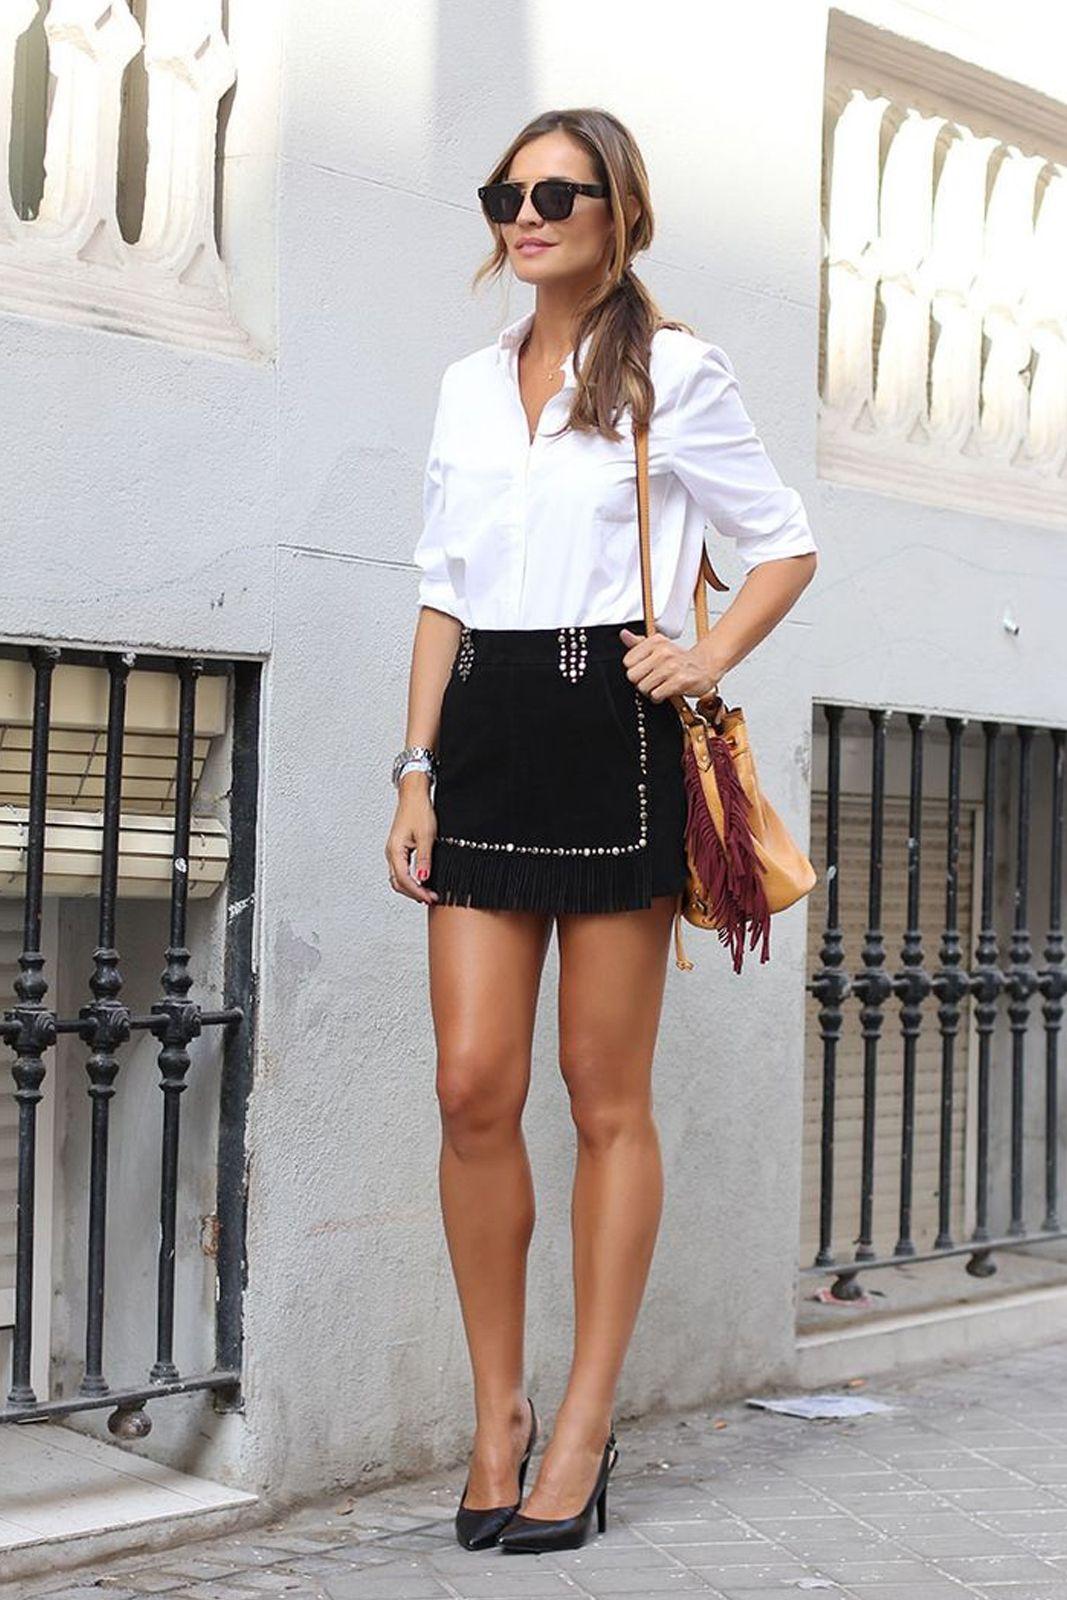 Bikin Gebetan Jadi Pacarmu dengan 5 Tips Fashion Ini